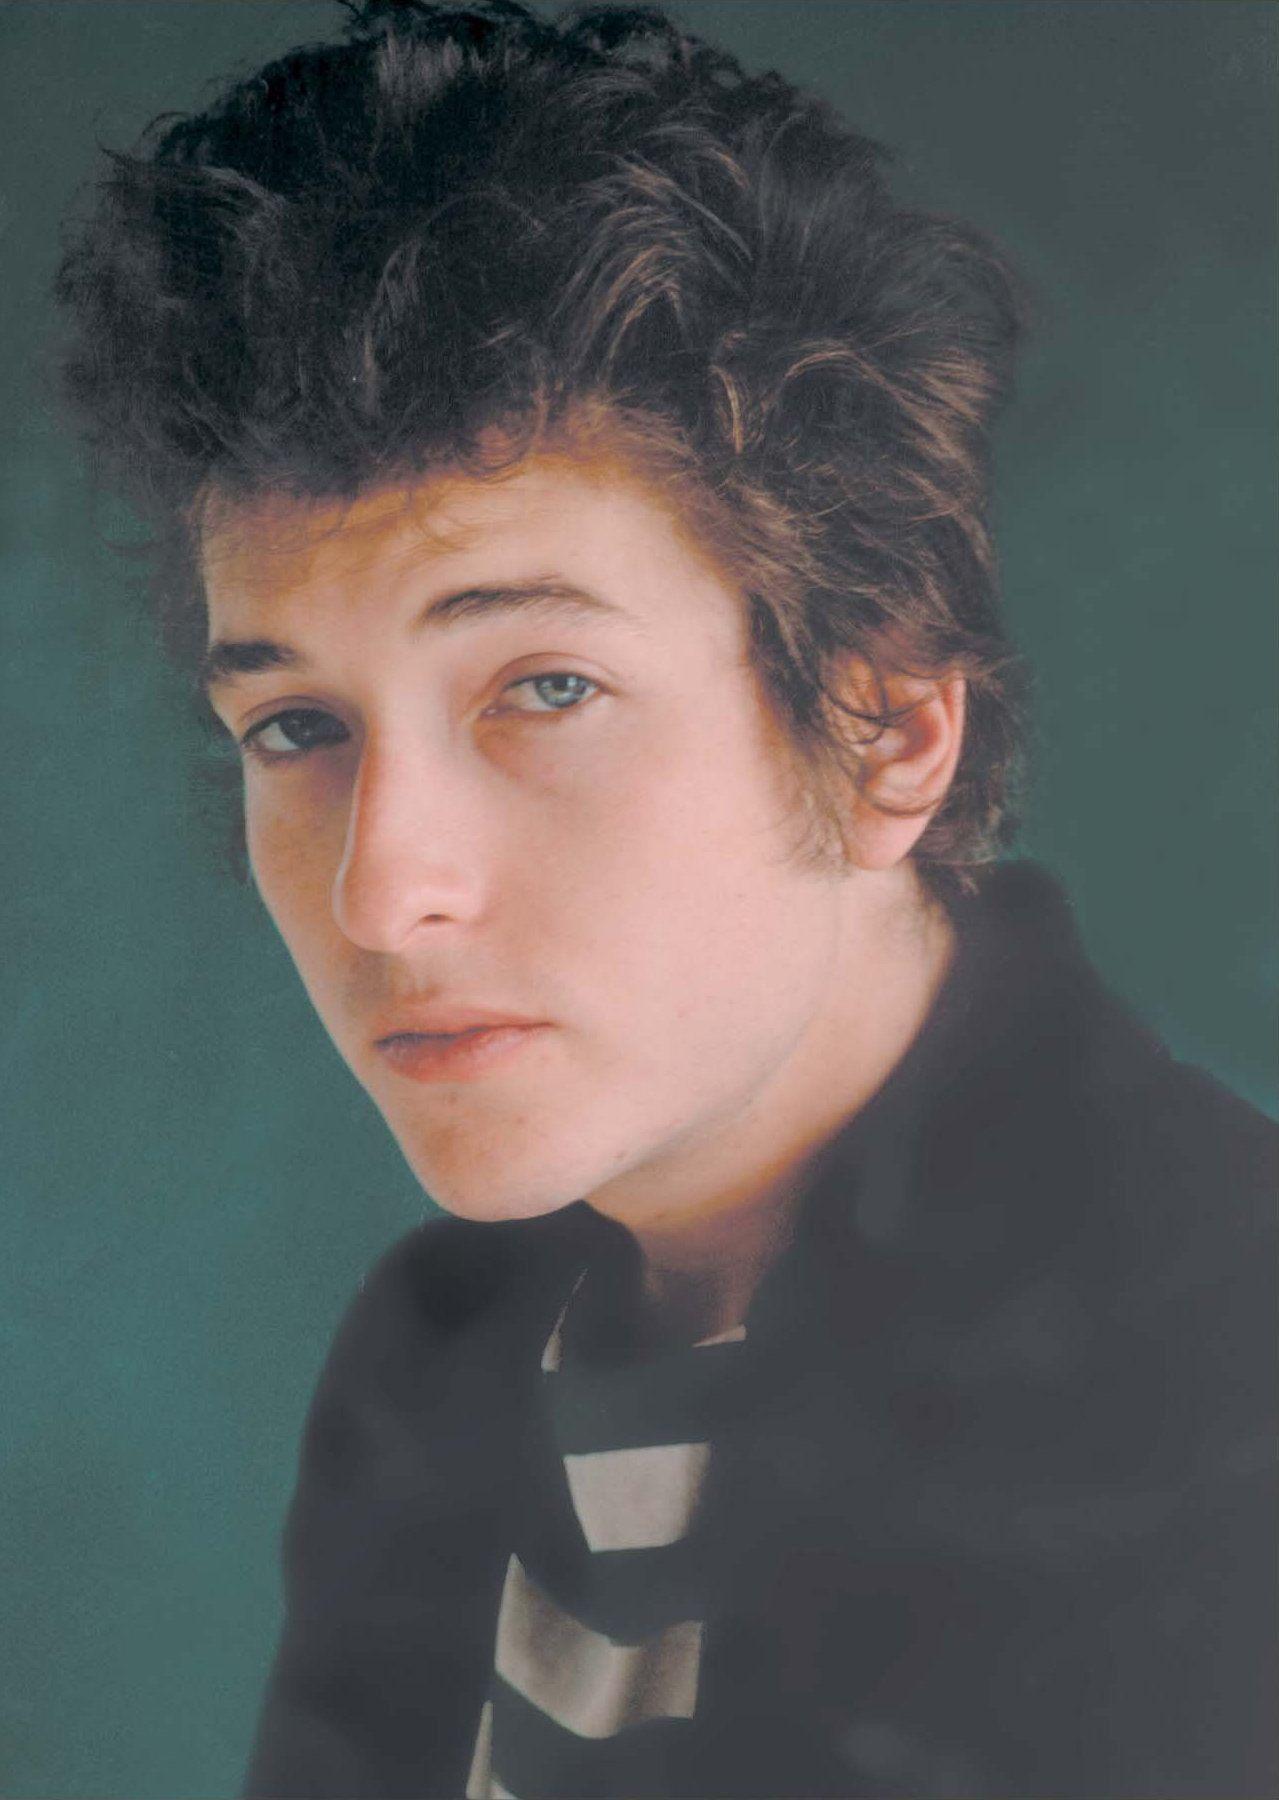 DARK EYES CHORDS (ver 2) by Bob Dylan @ Ultimate-Guitar.Com